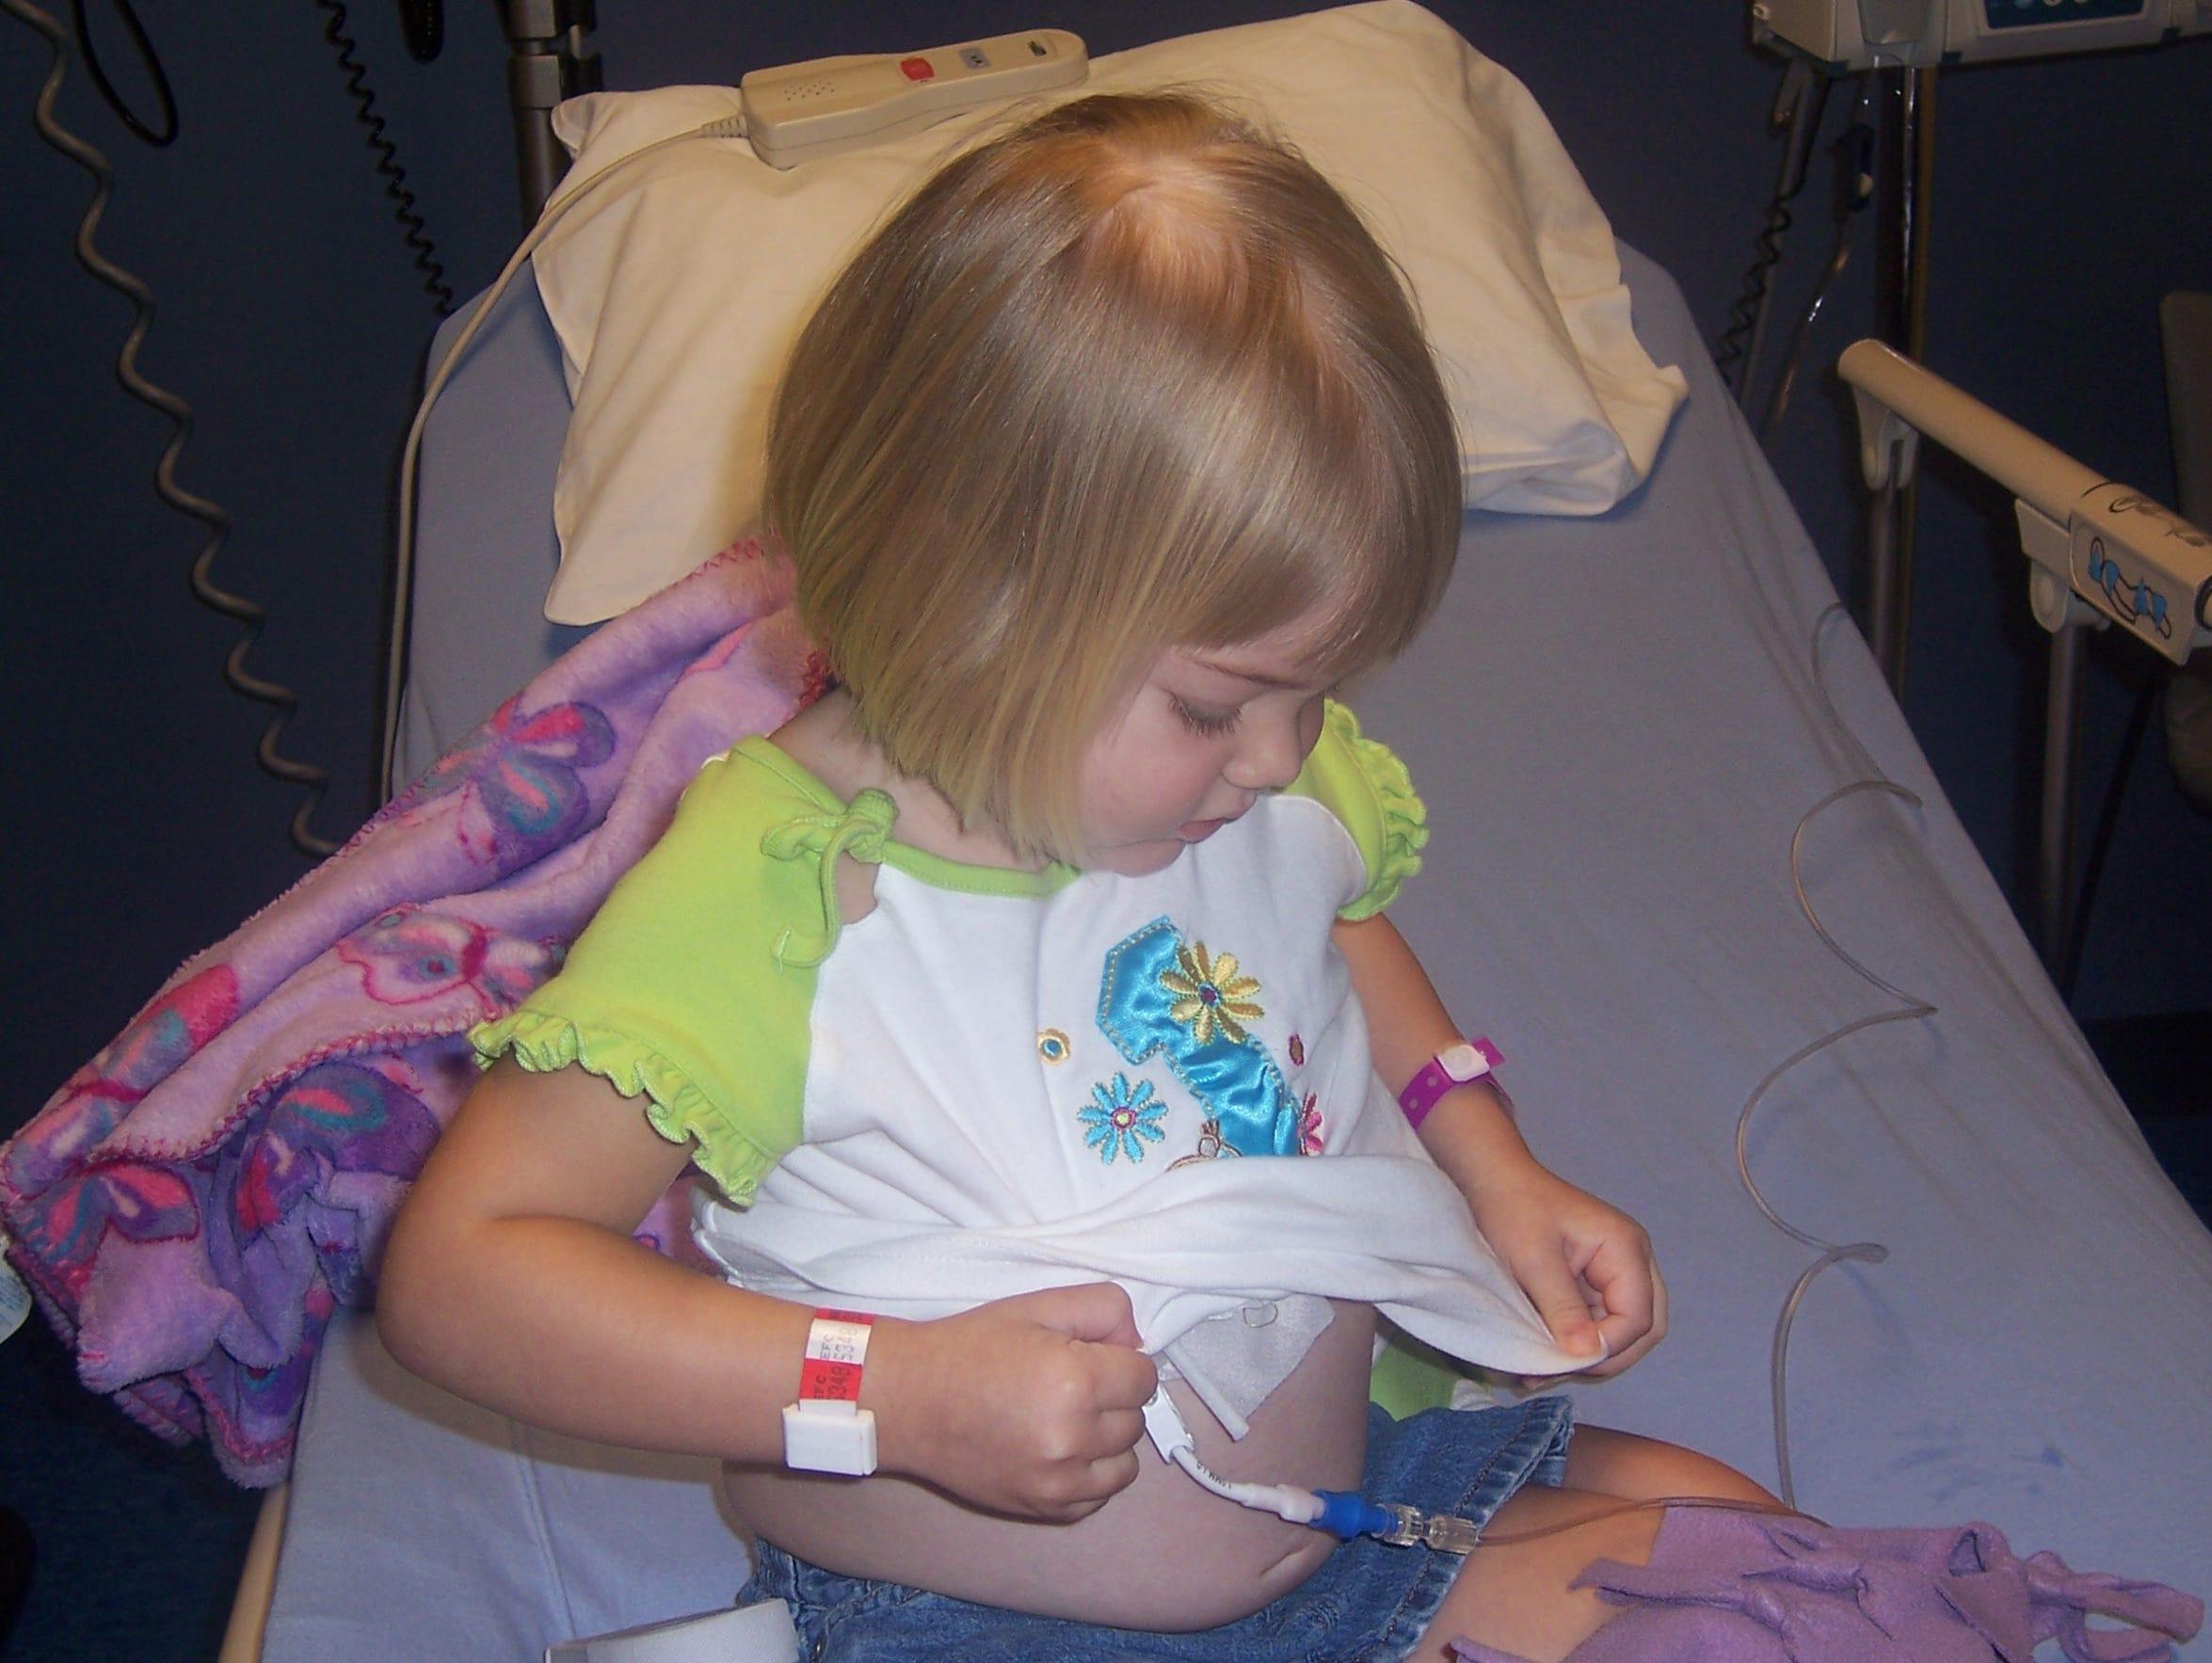 Kacie Francois underwent extensive chemotherapy the